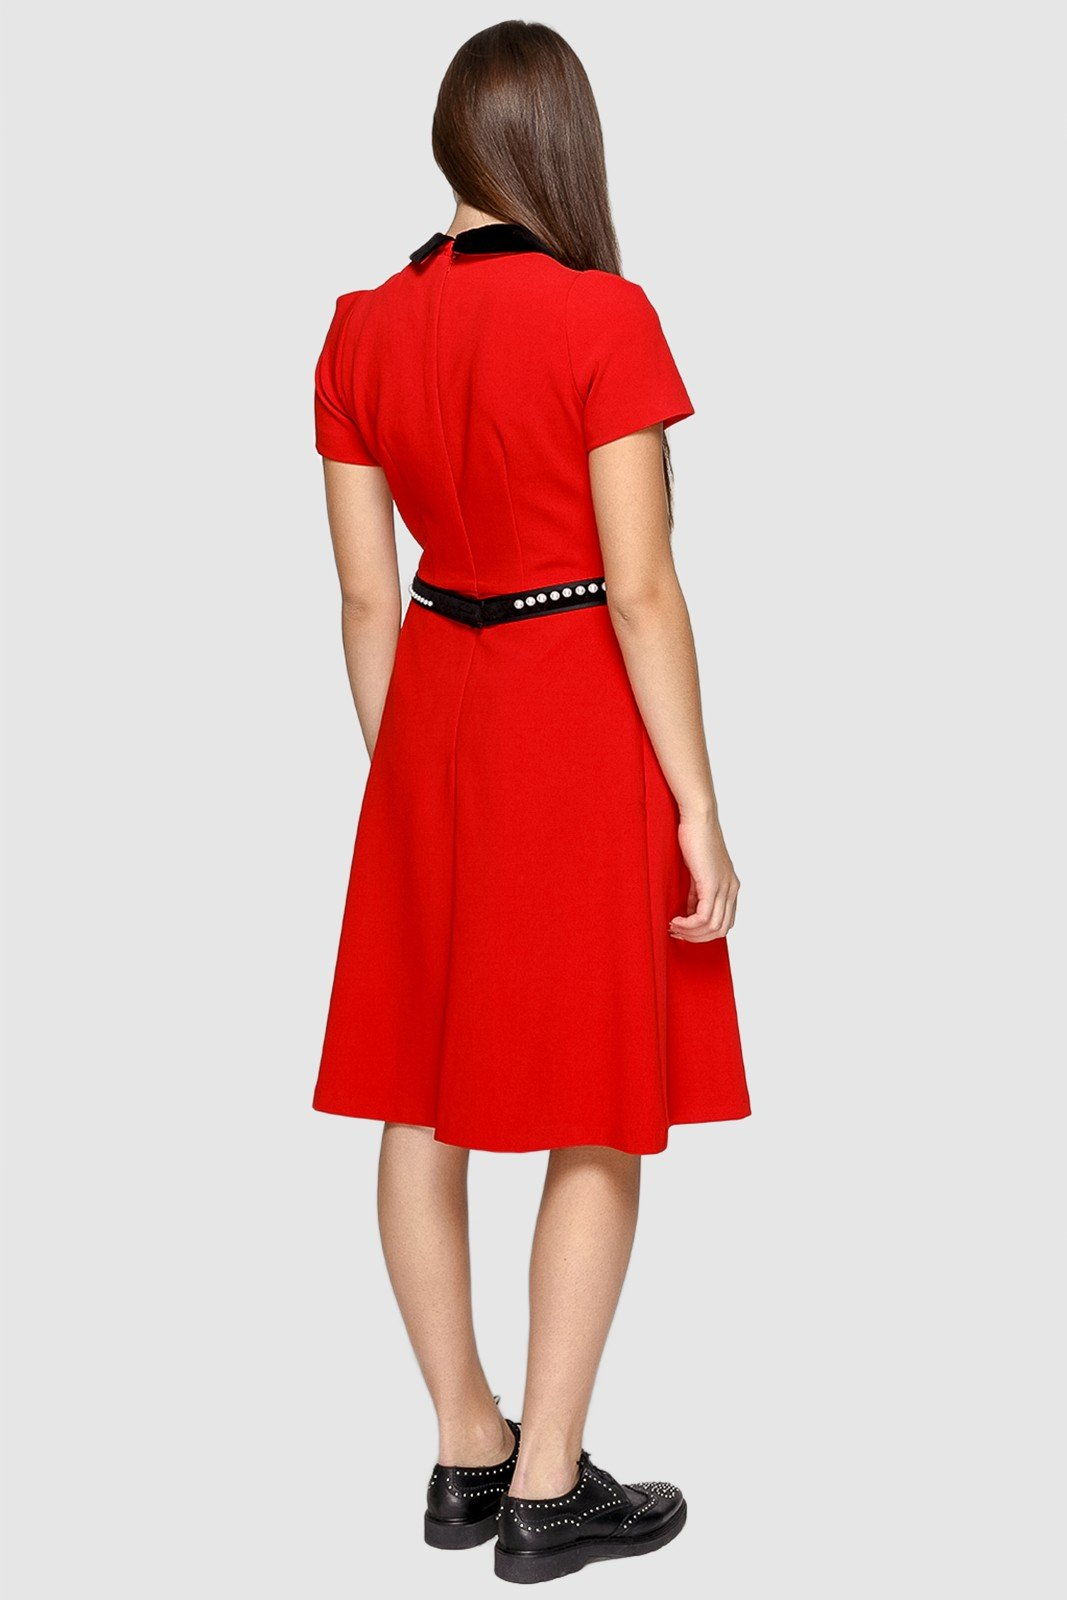 Платье Ньюарк